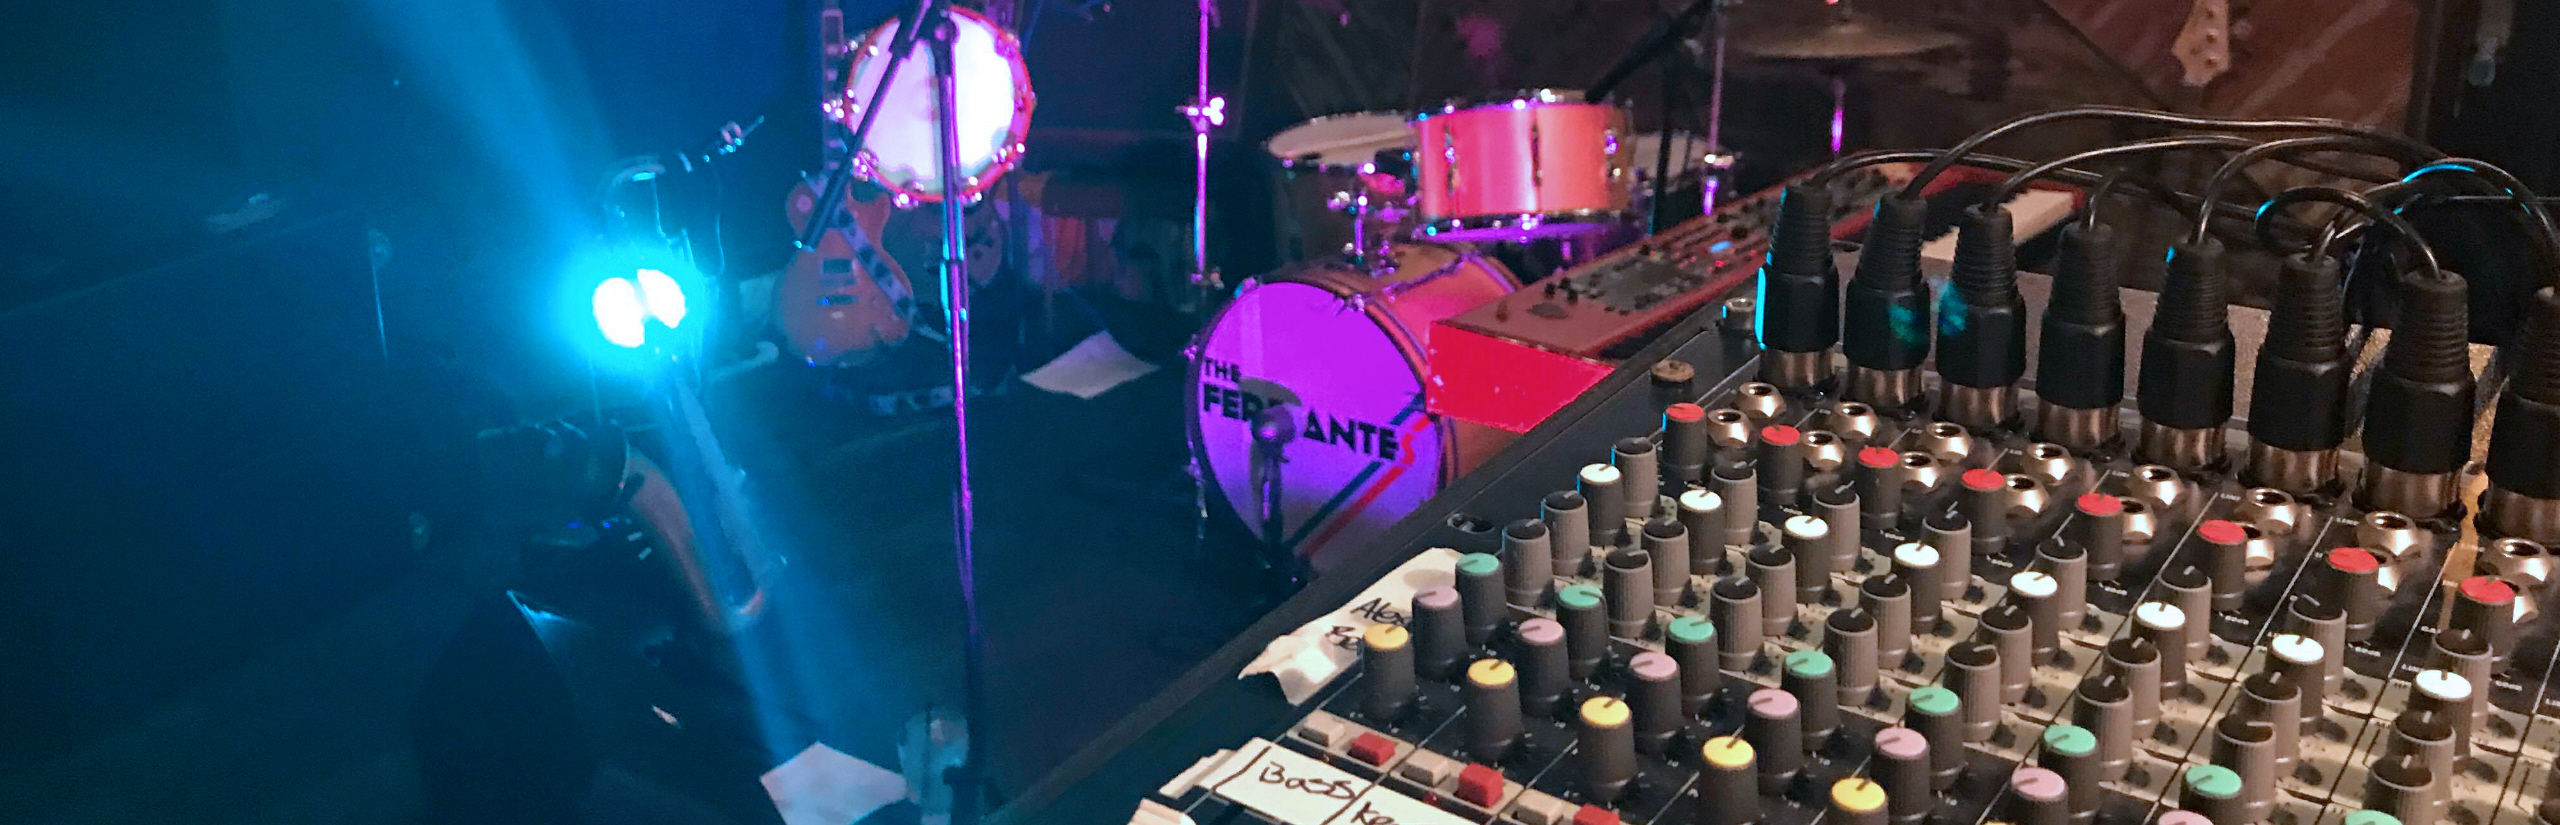 Live Music Sound Hire Band Equipment Rental Band Lighting Exeter Devon 1